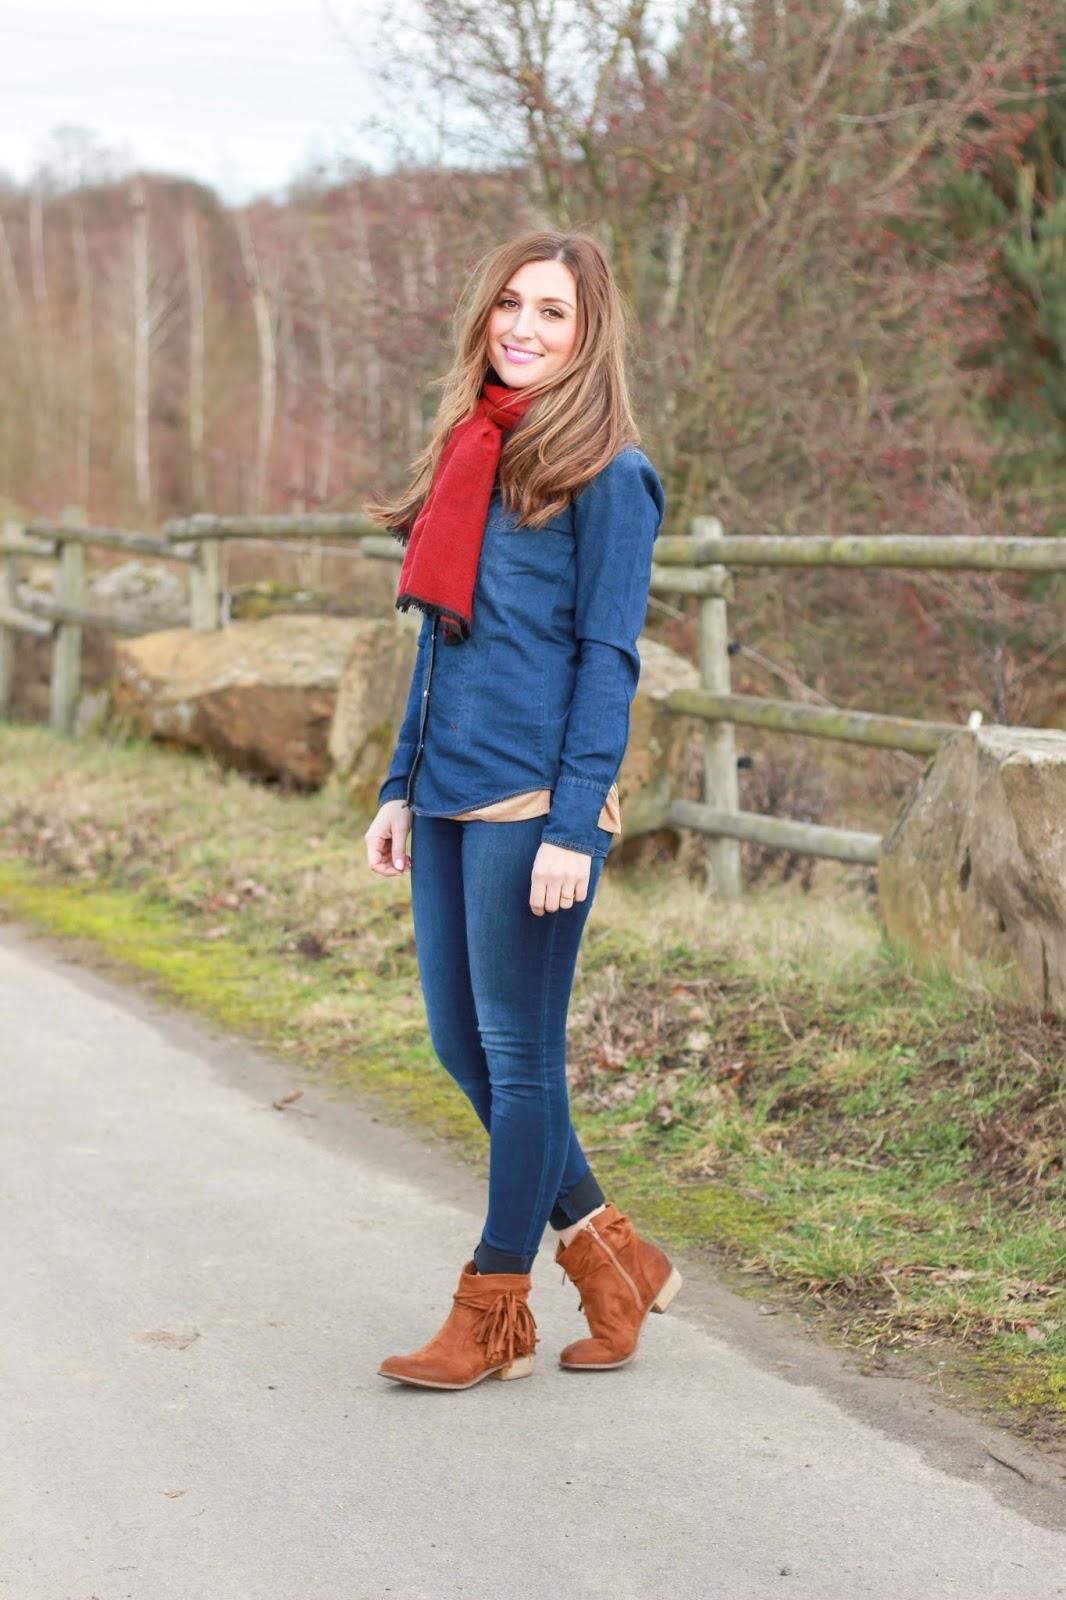 Country Look - DEnim Look - Inspiration Fashionblogger - Fashionblogger Outfit inspiration - Inspiration -Outfitinspiration Fashionblogger - Frankfurt Fashionblogger - Fashionblogger aus Deutschland - Fashionblogger aus Frankfurt - Deutschlands Beste Fashionblogger